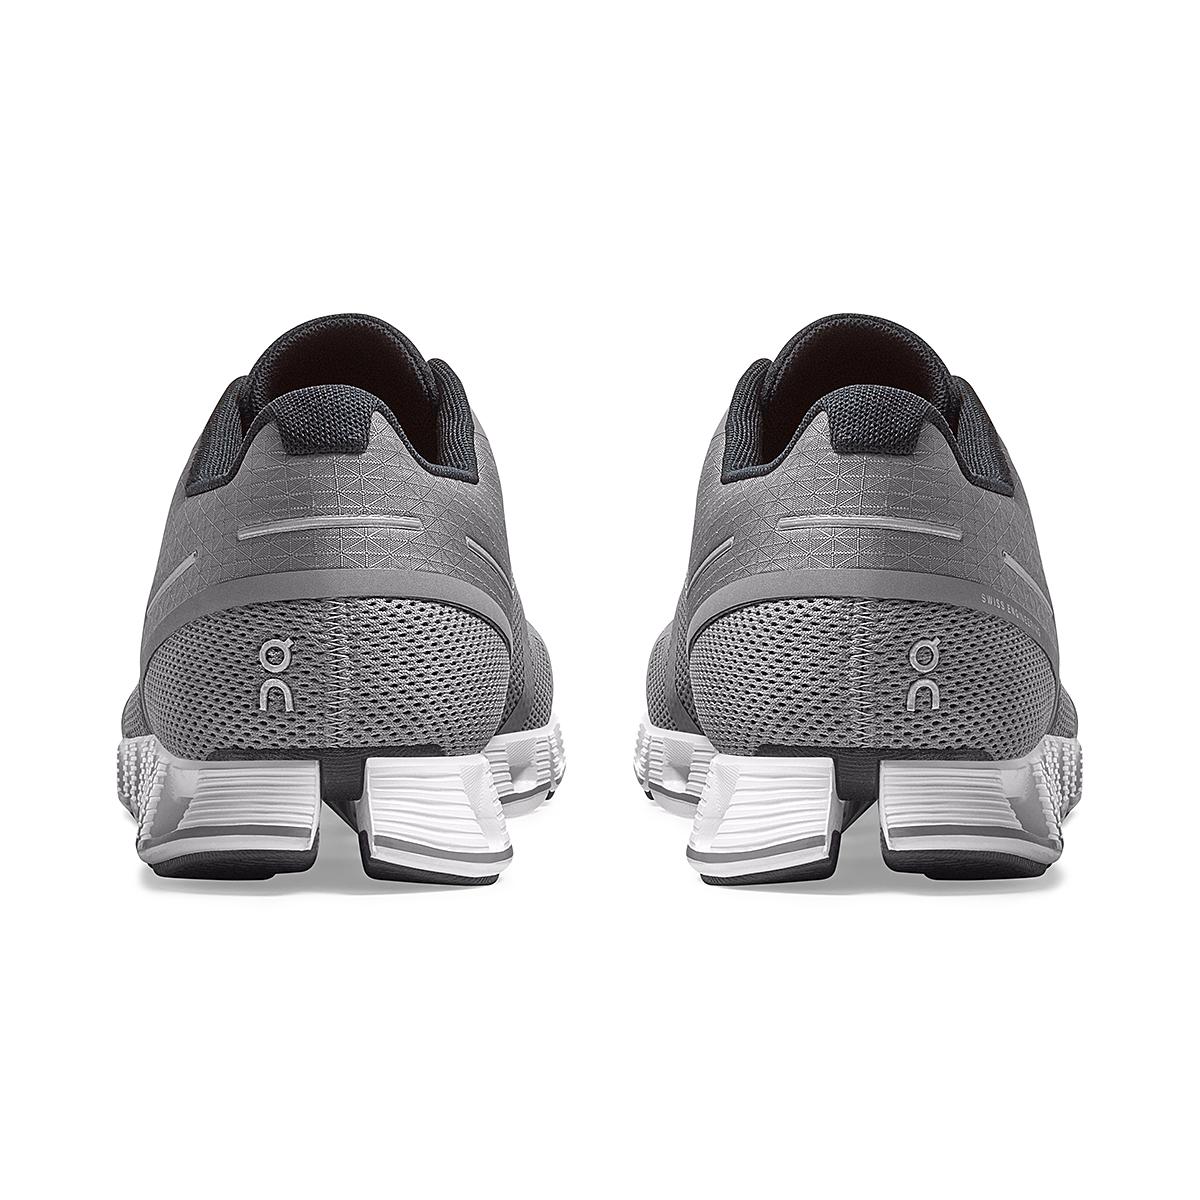 Men's On Cloud Running Shoe - Color: Zinc/White - Size: 7 - Width: Regular, Zinc/White, large, image 5